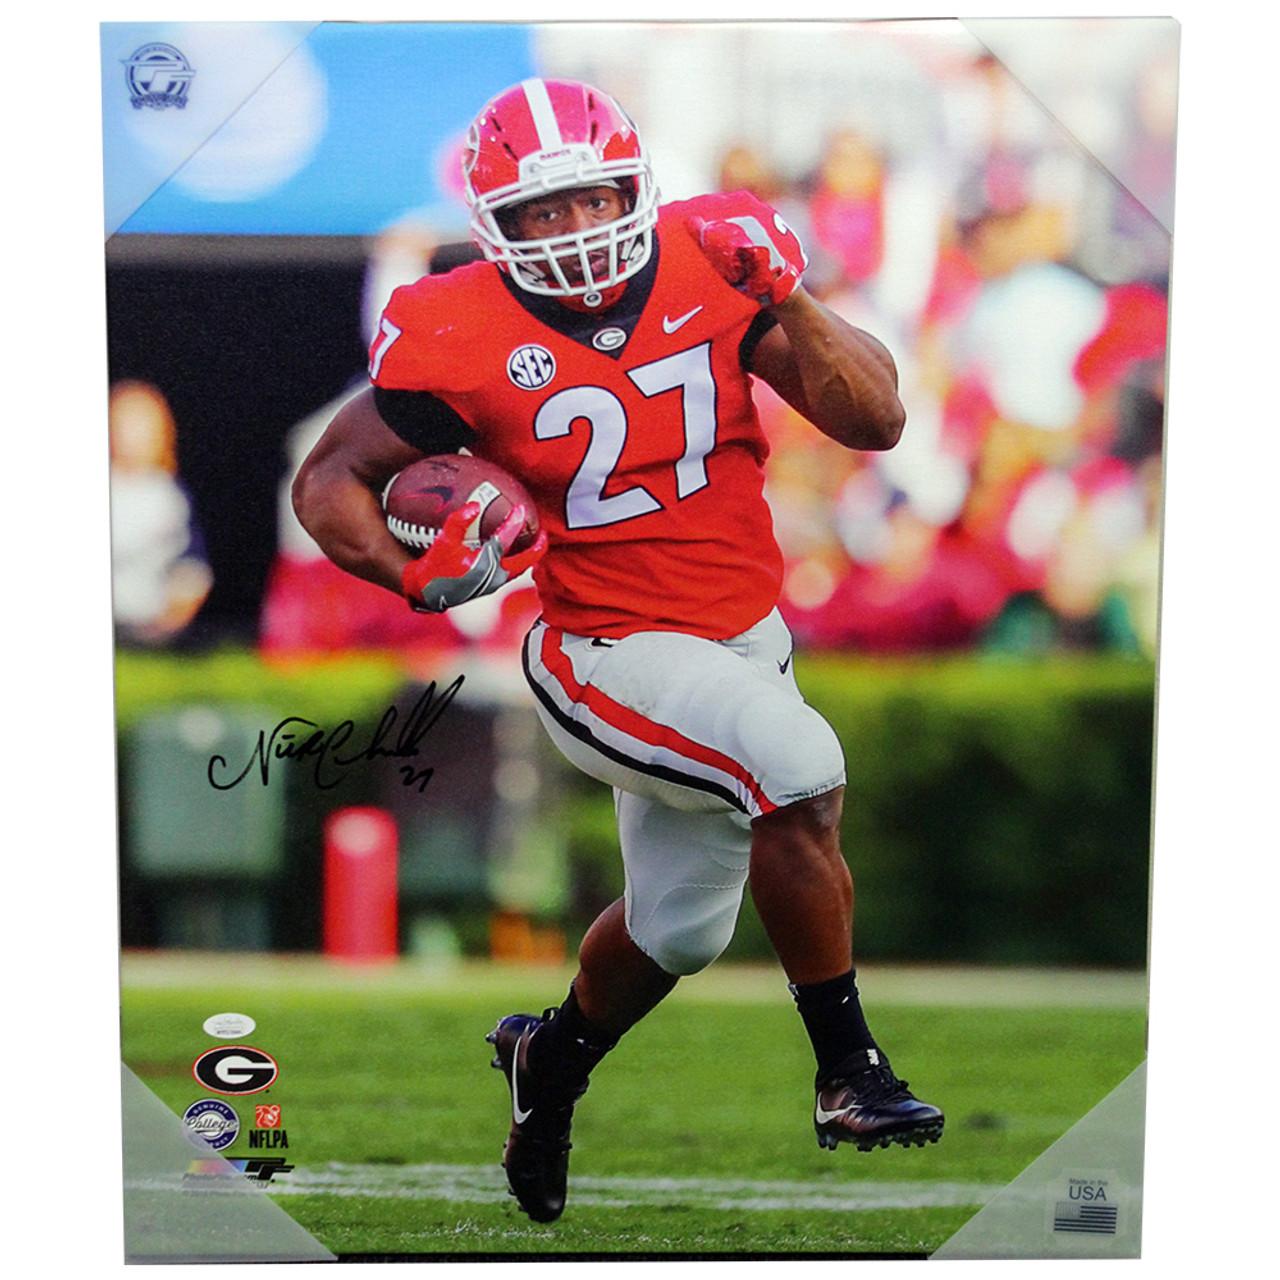 pretty nice aa827 7448c Nick Chubb Autographed Georgia Bulldogs Canvas - Red Jersey Running Upfield  - JSA Certified Authentic